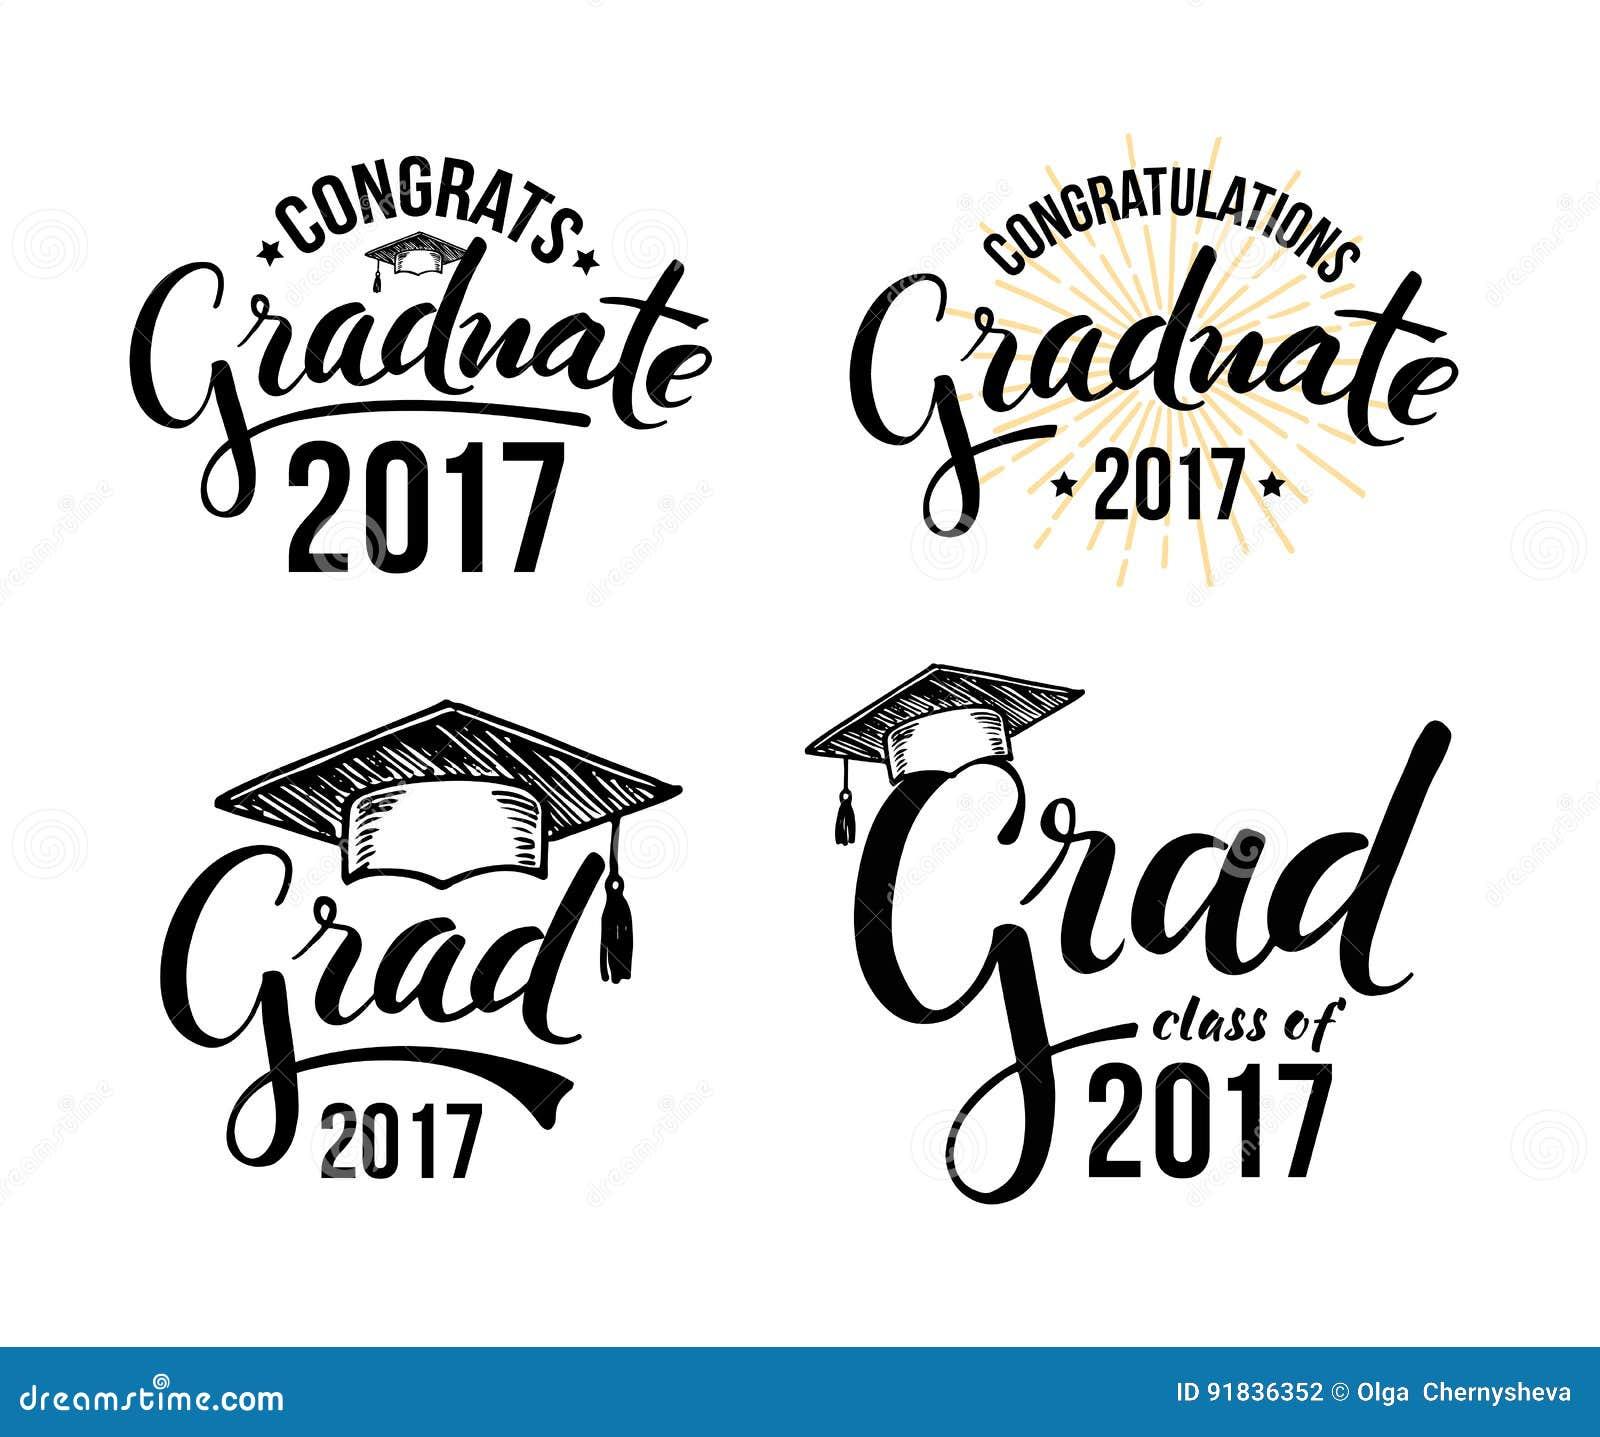 congratulations graduate 2017 stock vector illustration of